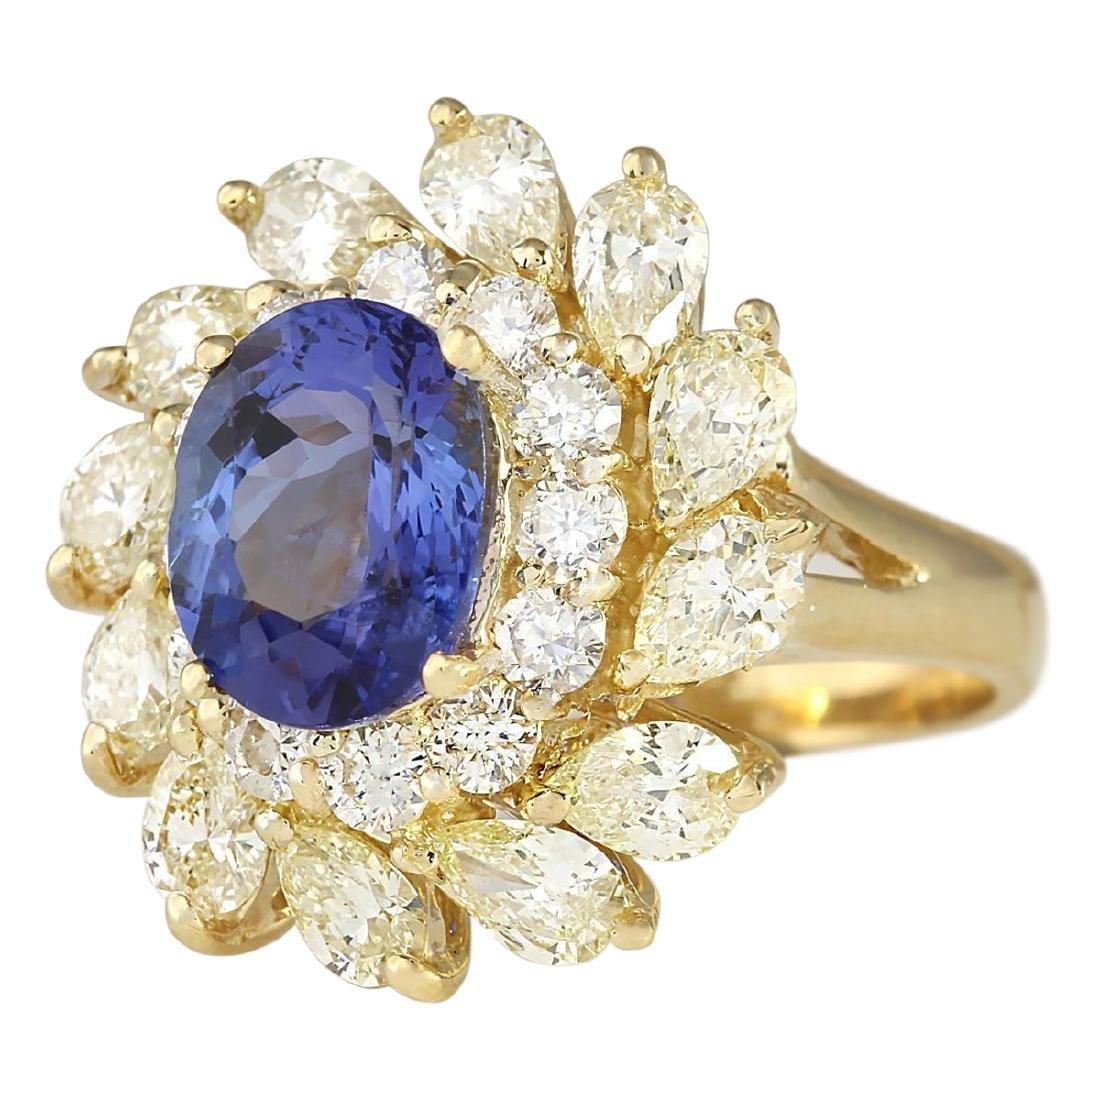 5.73 CTW Natural Tanzanite And Diamond Ring In 18K - 2